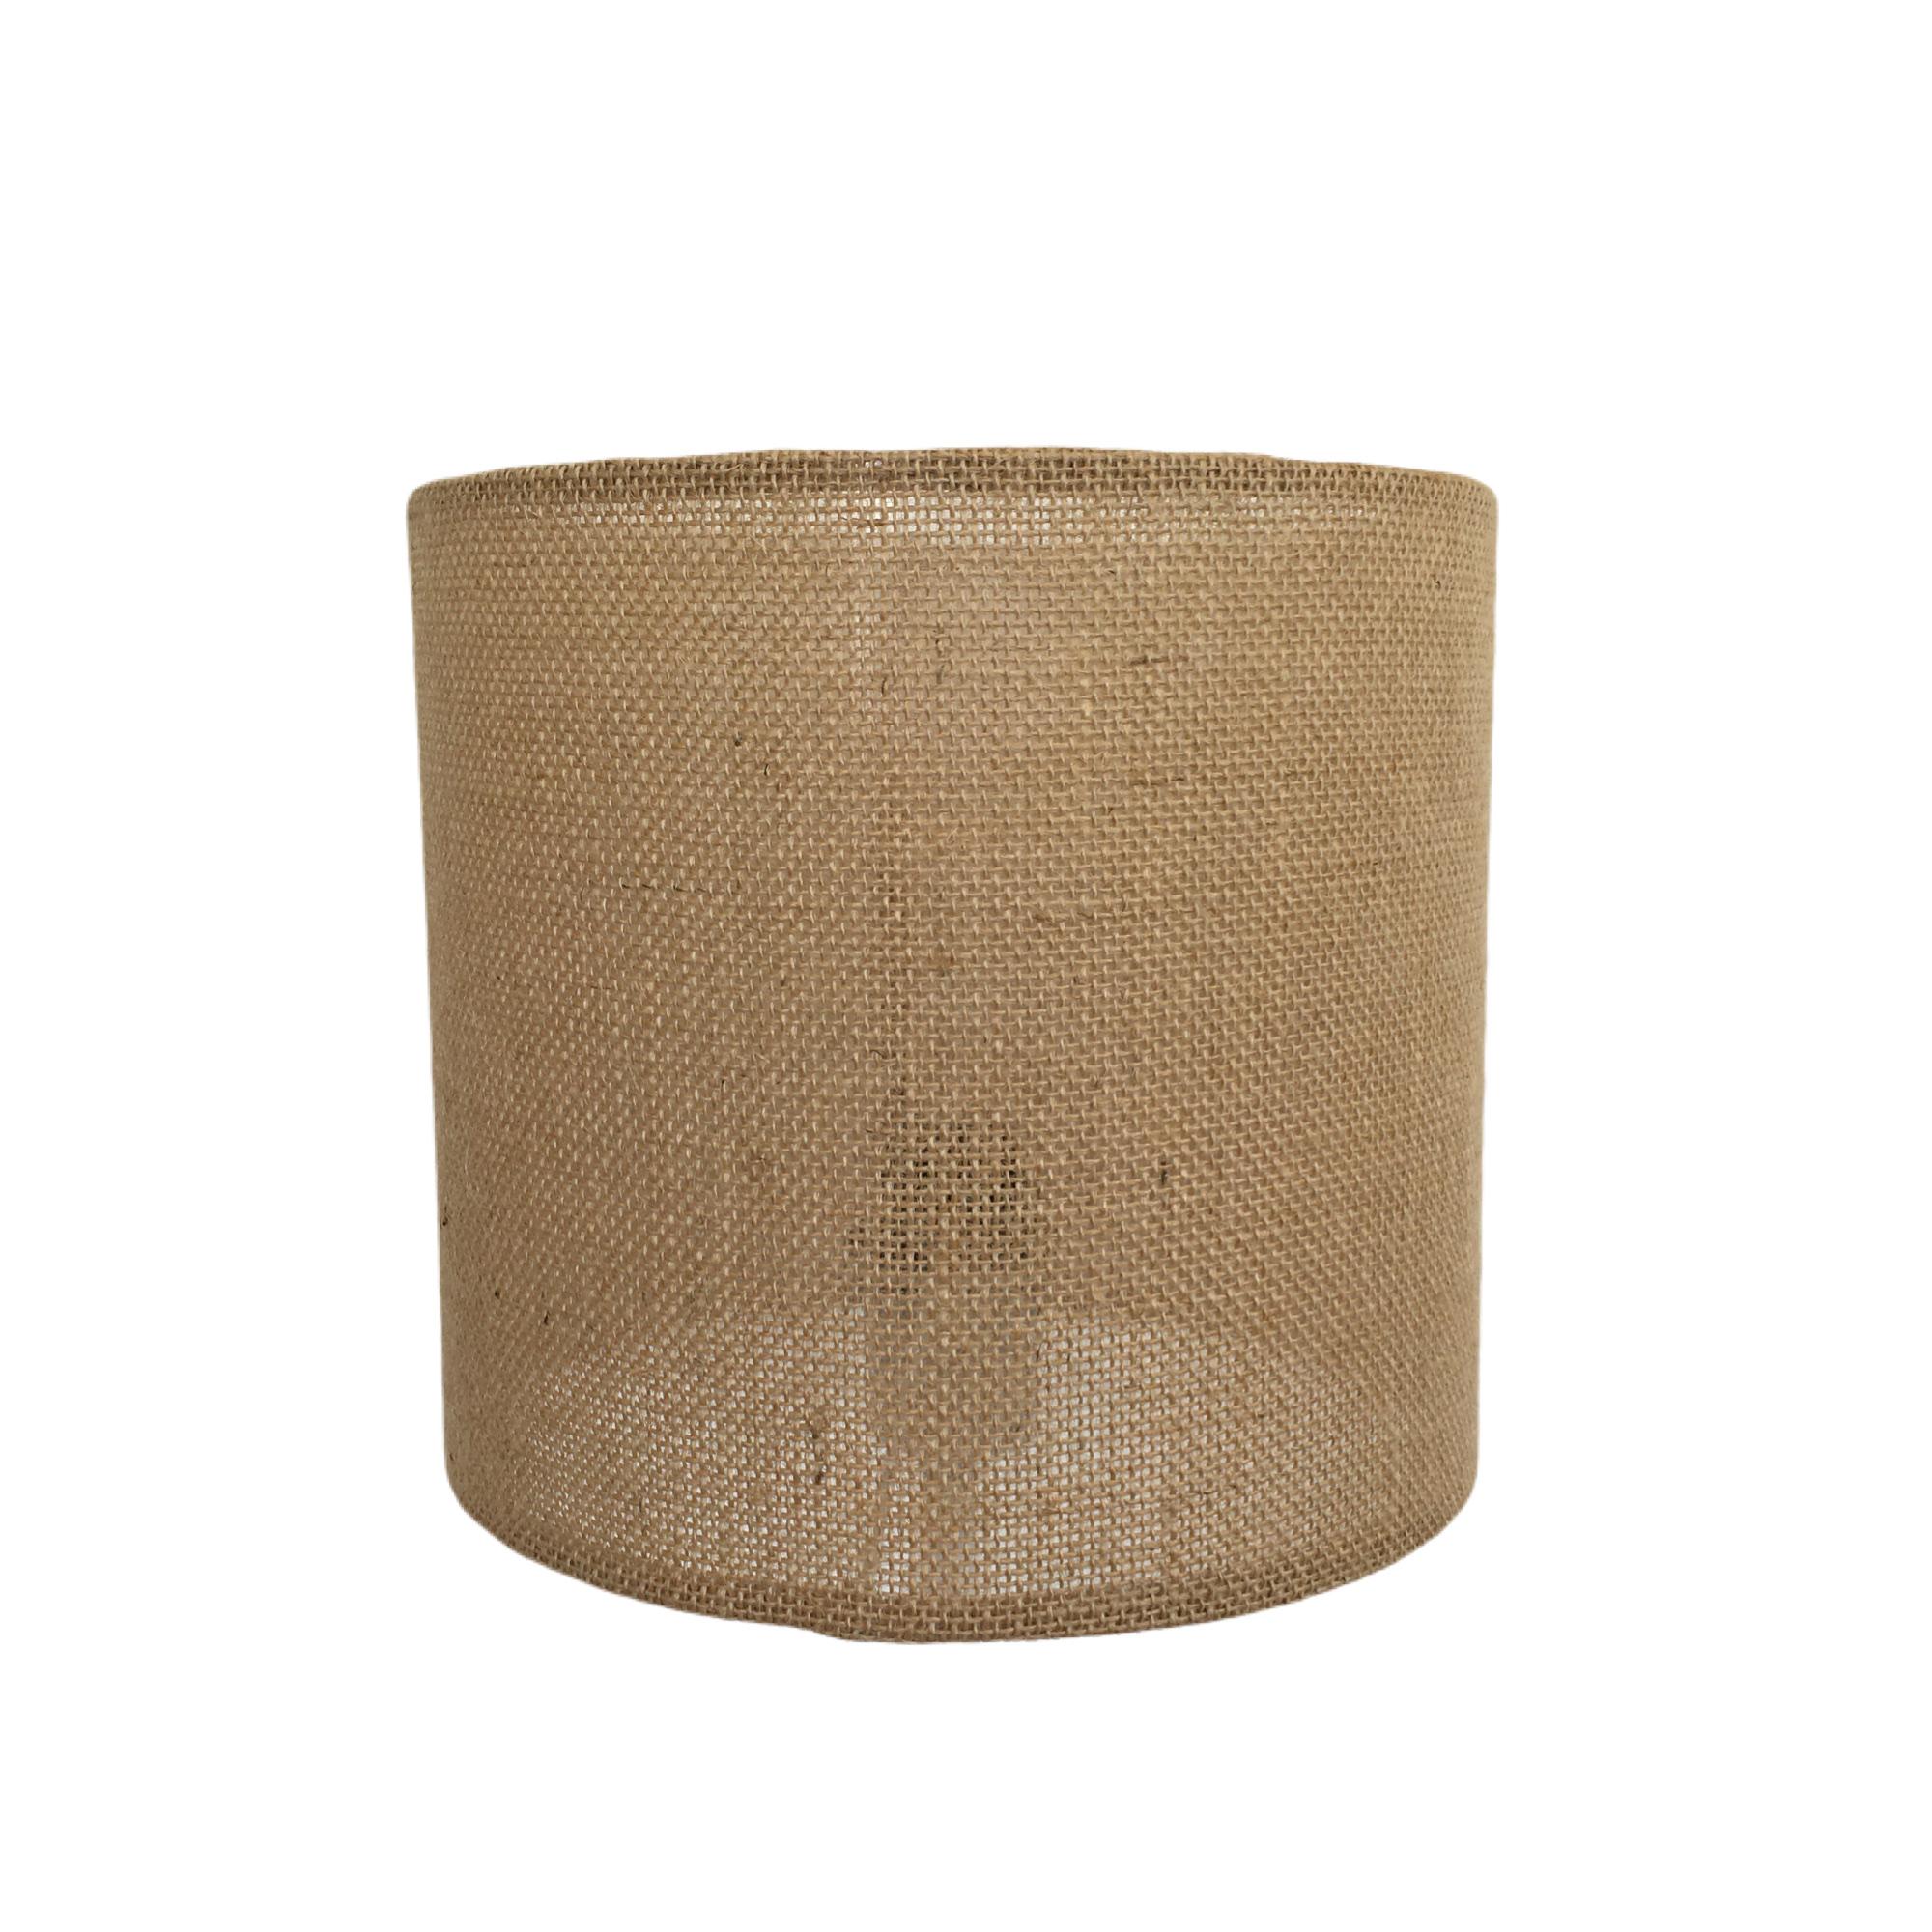 Suspension toile de jute diamètre 20 cm